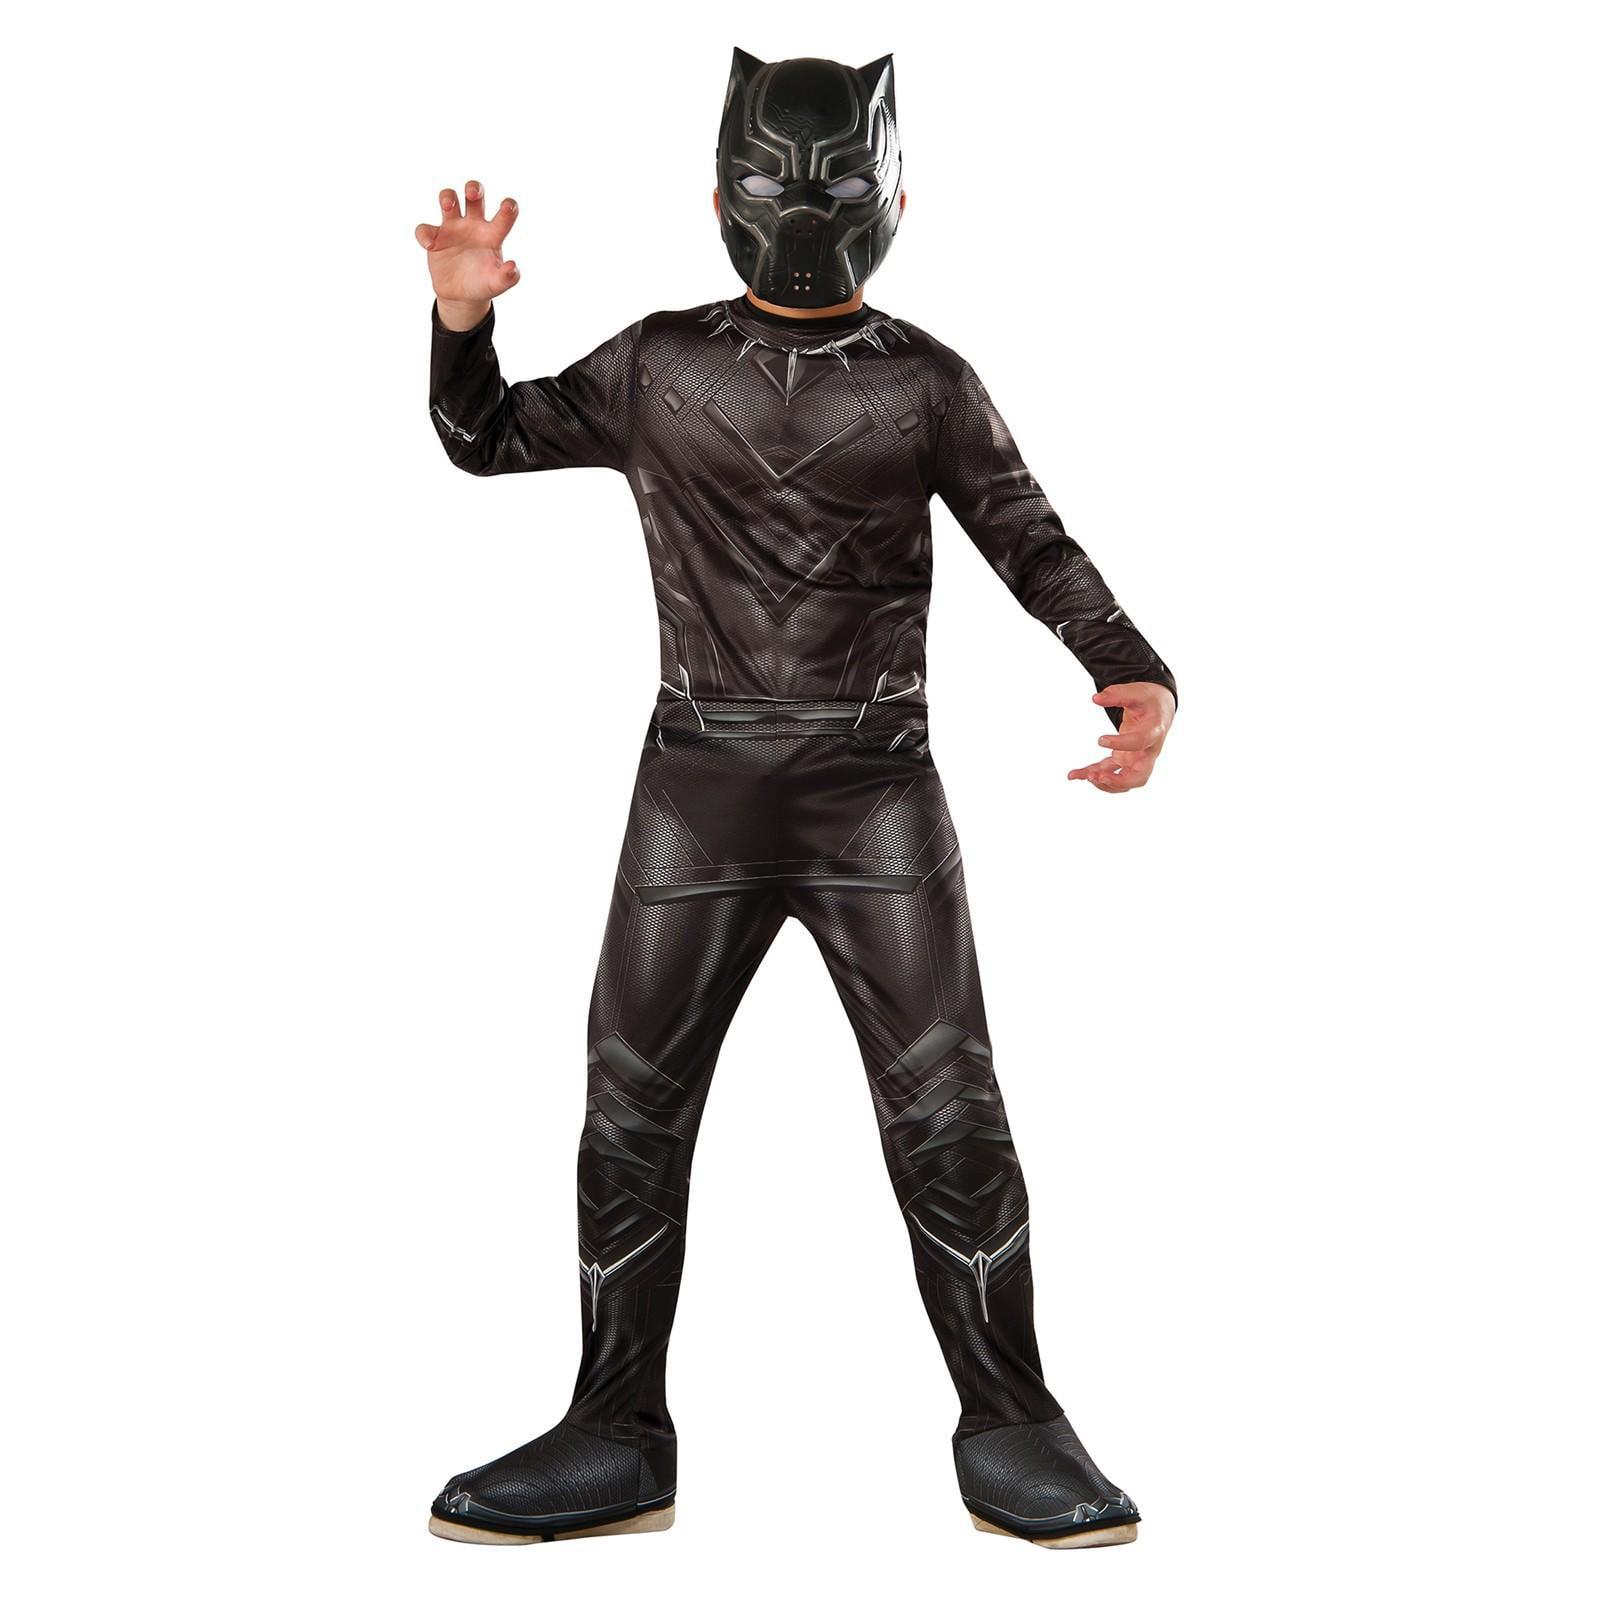 Captain America Civi War Black Widow Cosplay Shoes Black Long Boots Custom k.19